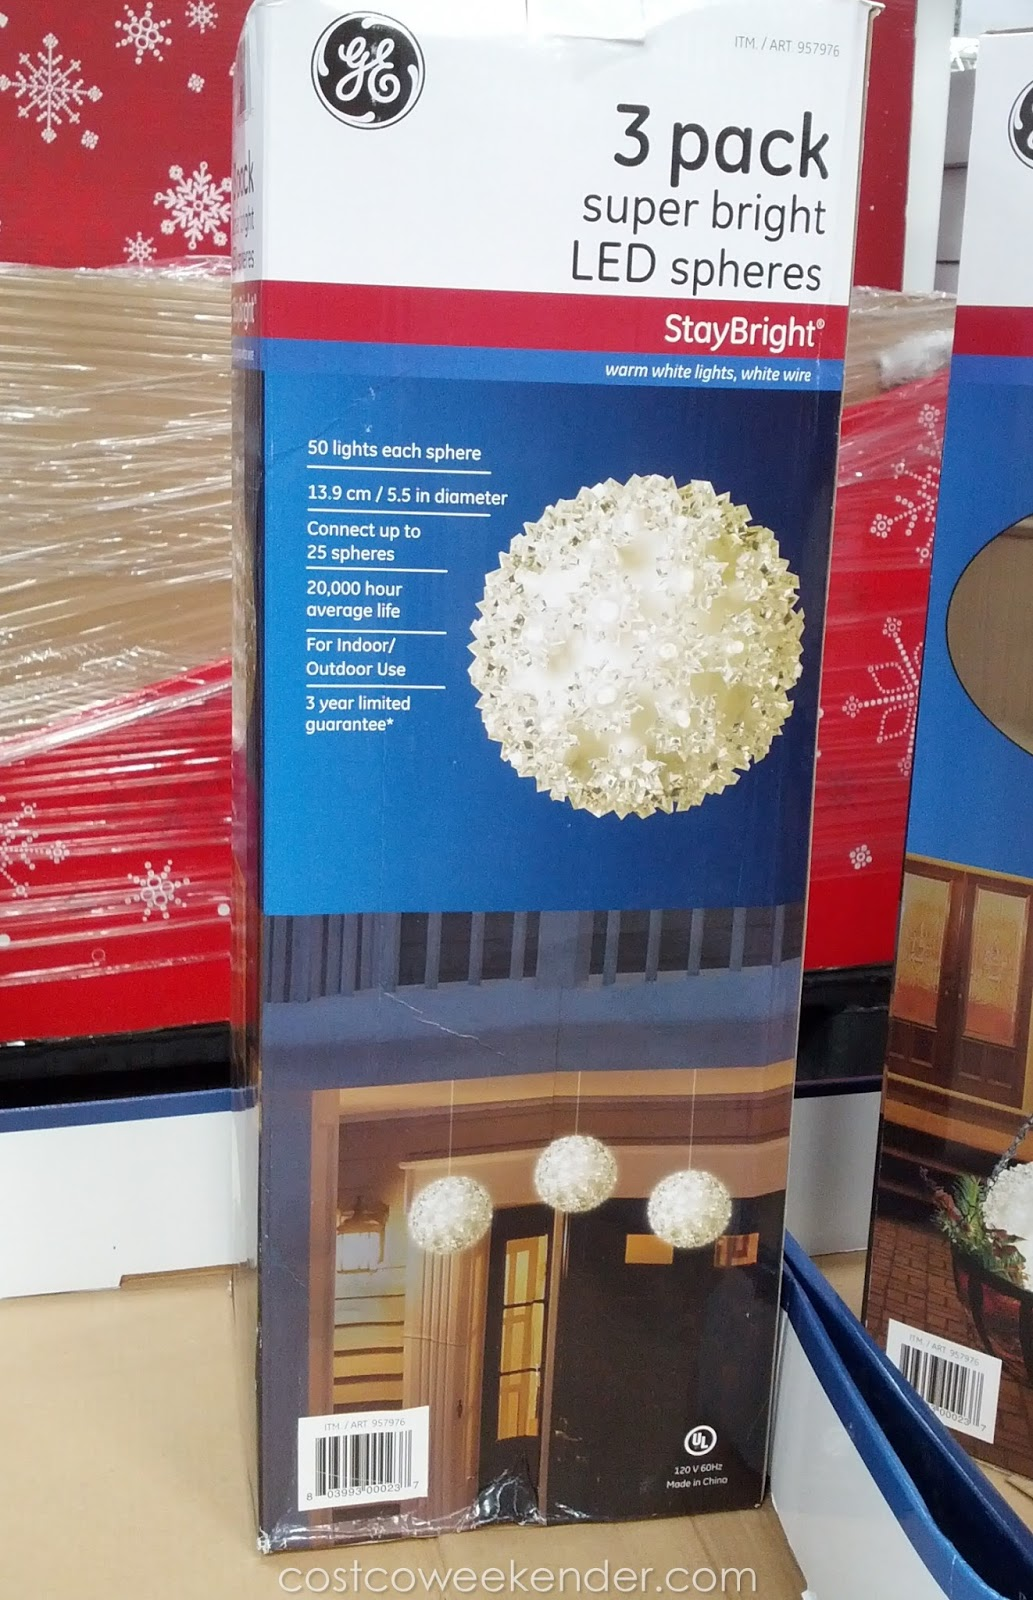 Ge Superbright Spheres Costco